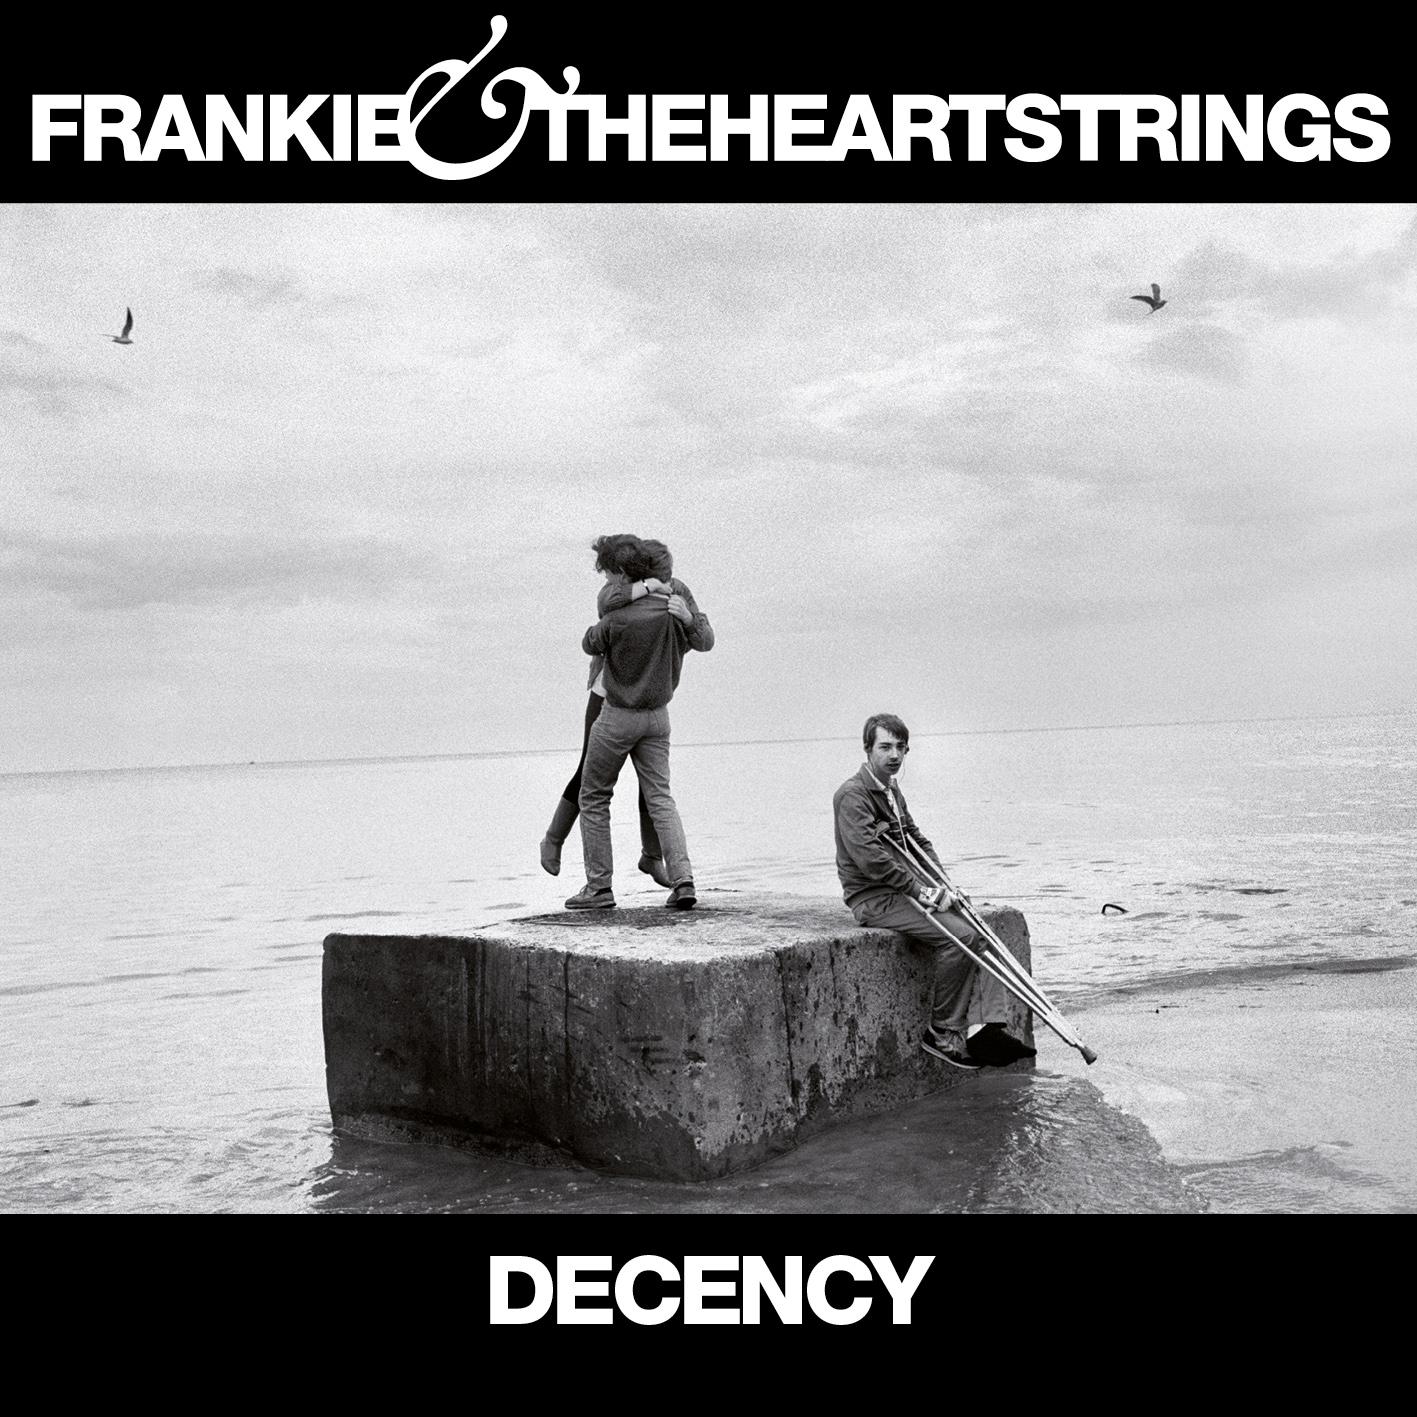 Frankie & The Heartstrings 3 X CD Bundle - Frankie & The Heartstrings